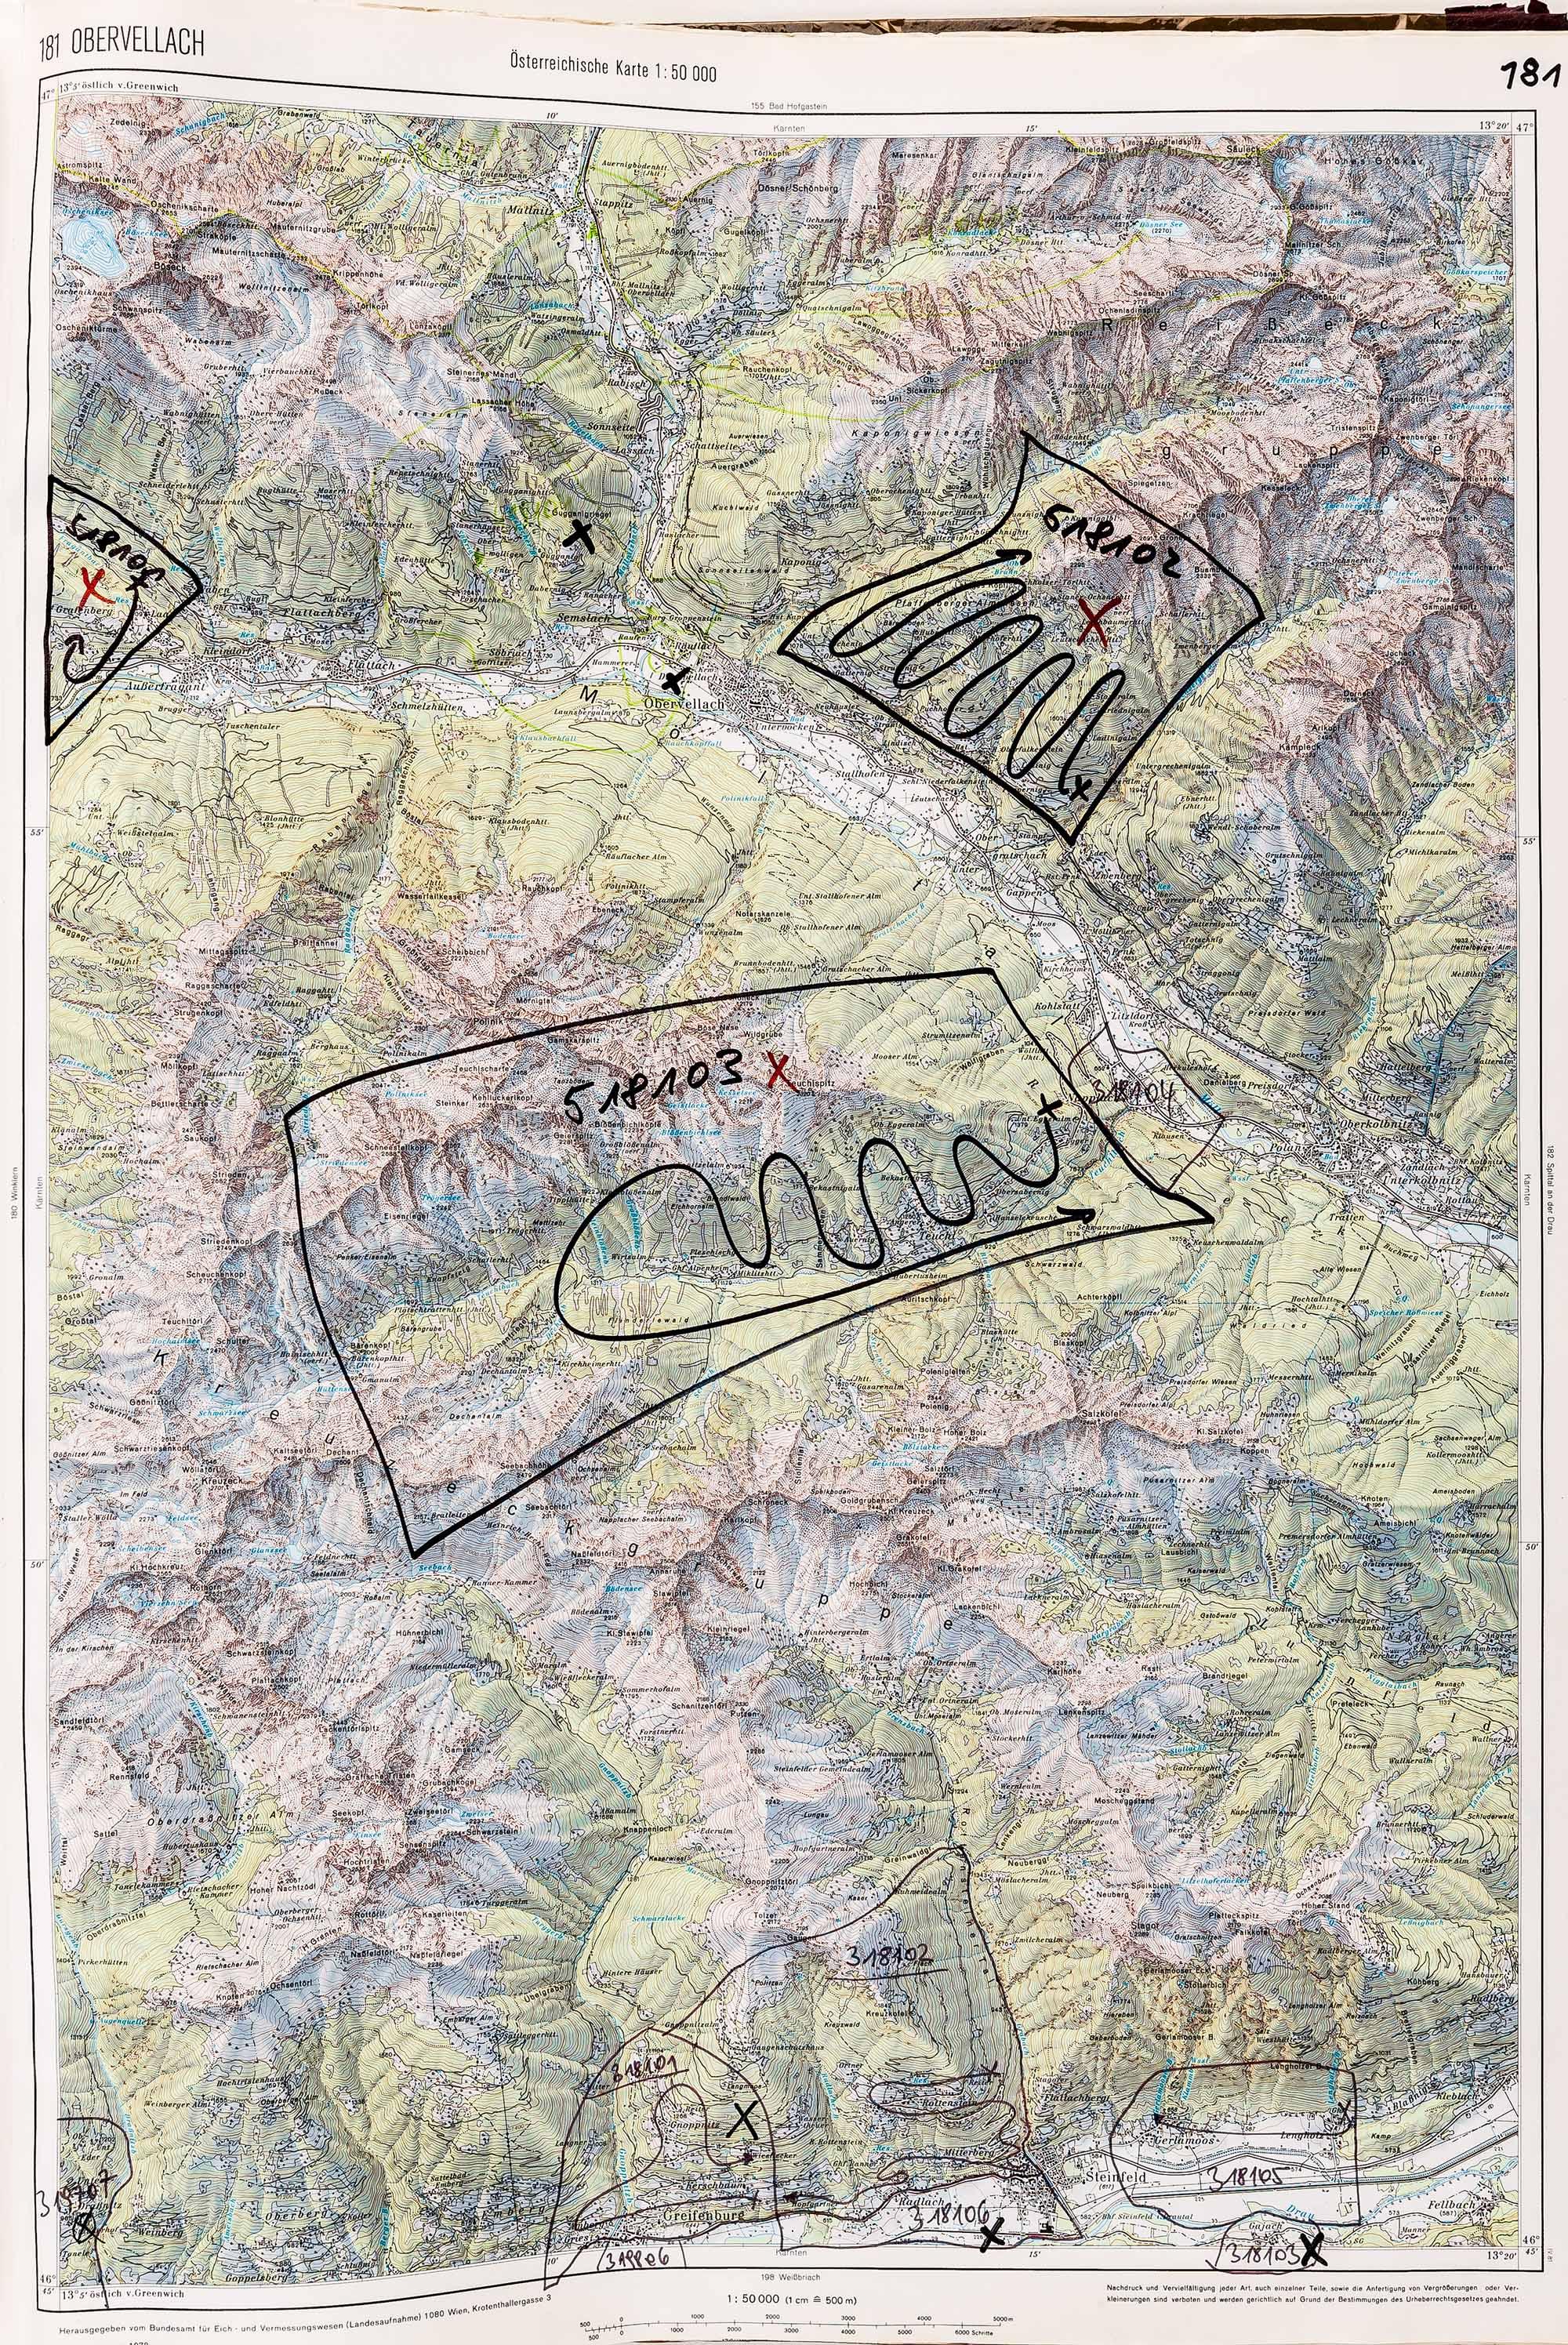 1983-1986 Karte 181